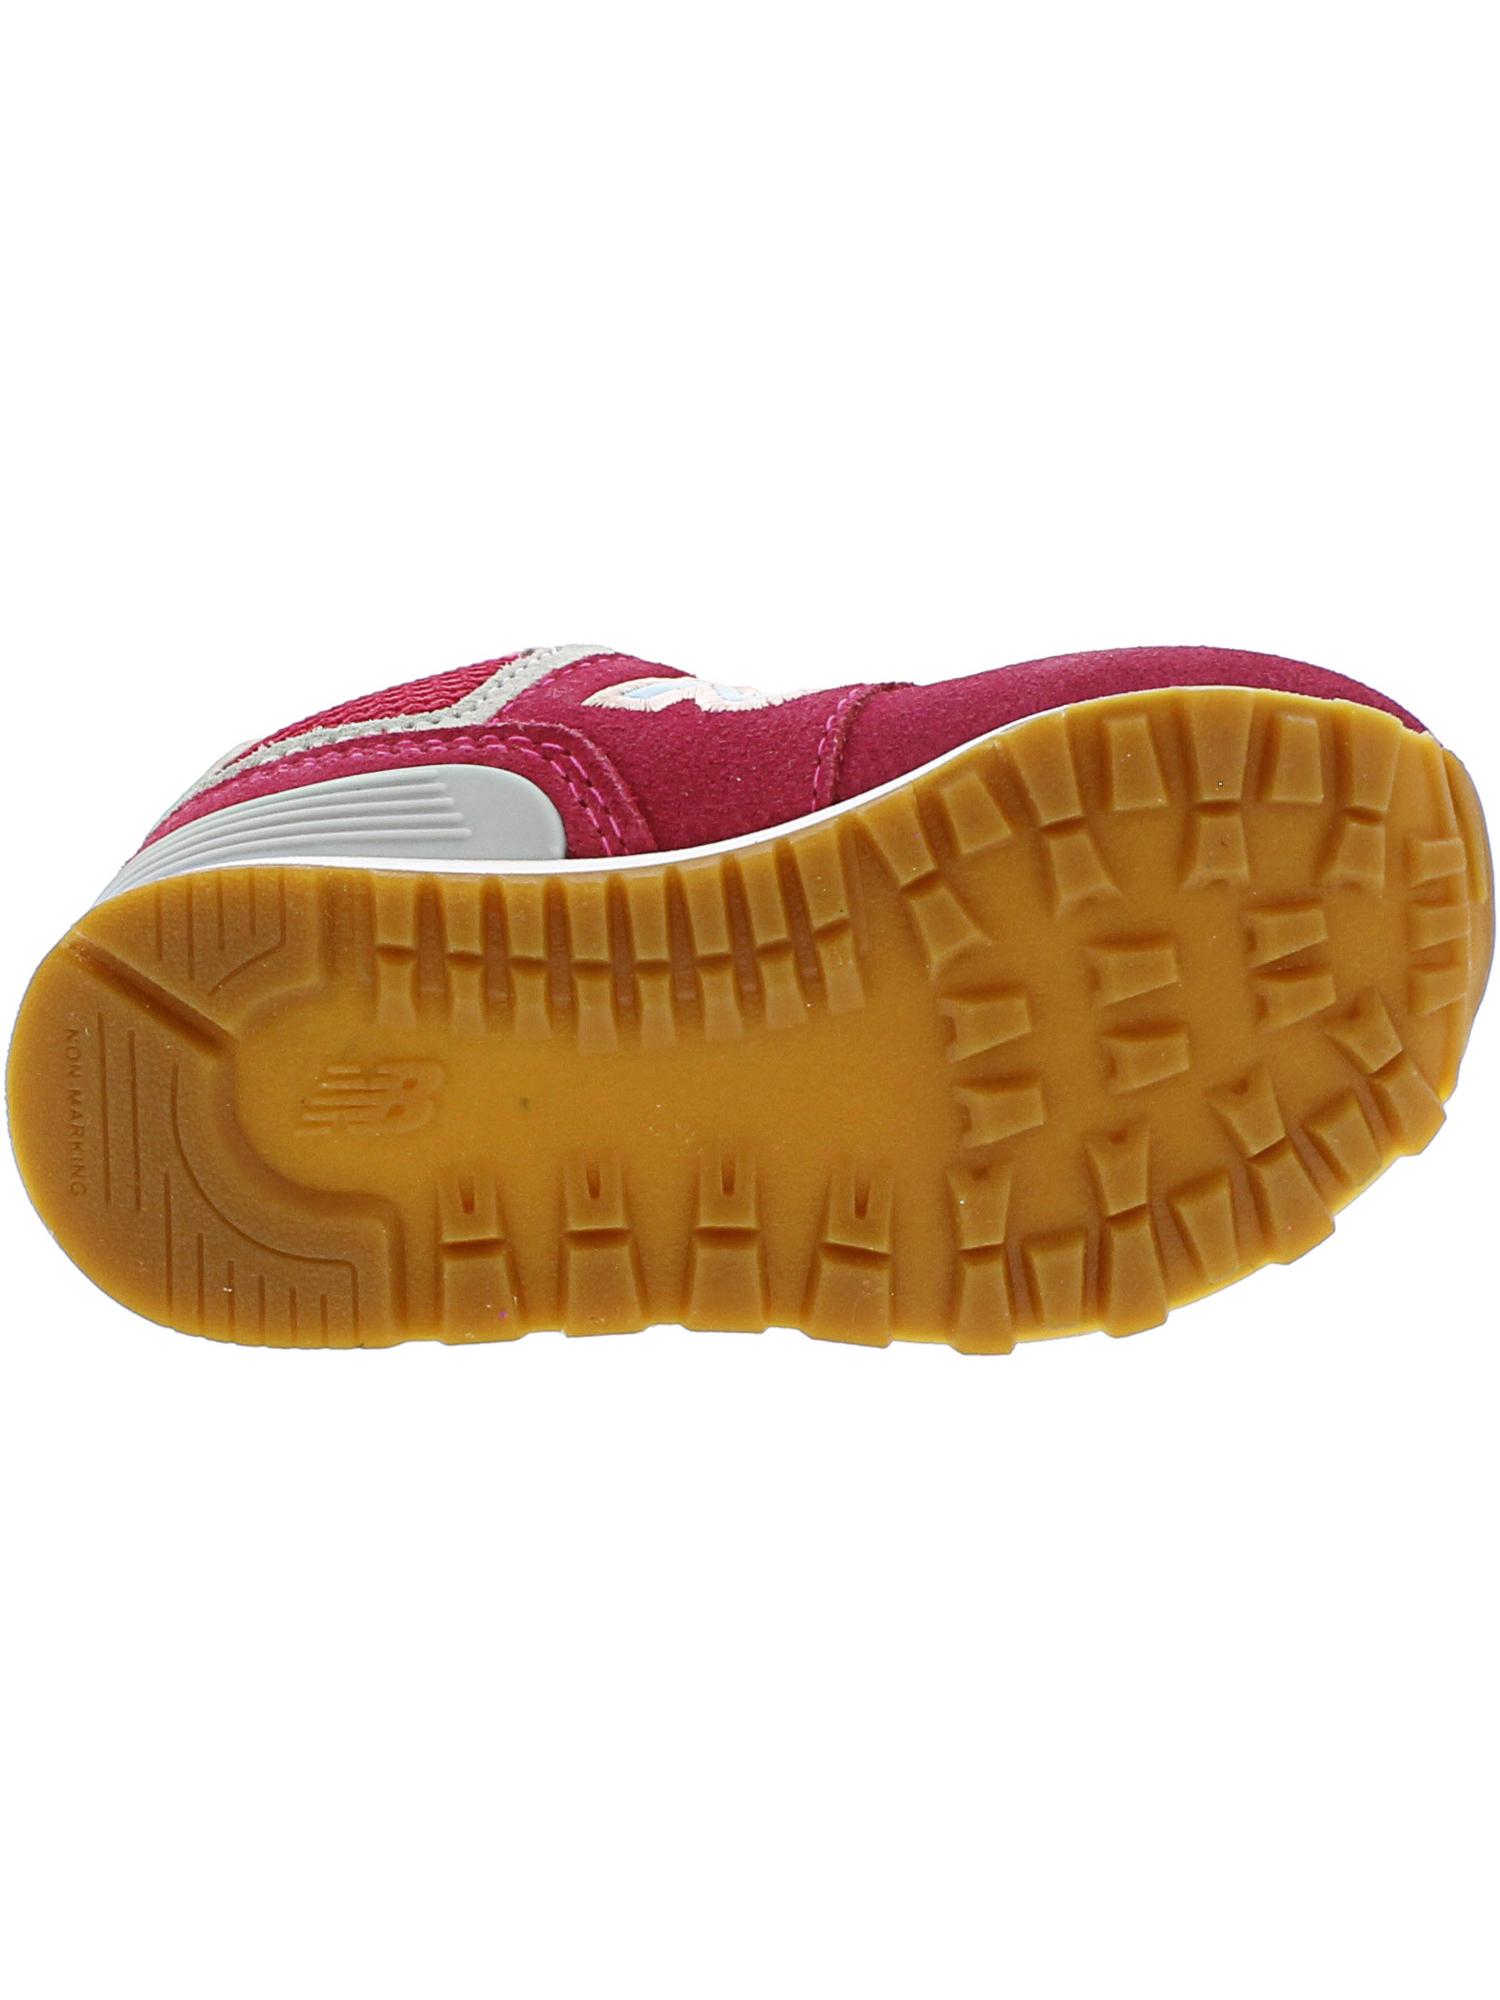 New Balance Kids Ic574 Casual Sneaker